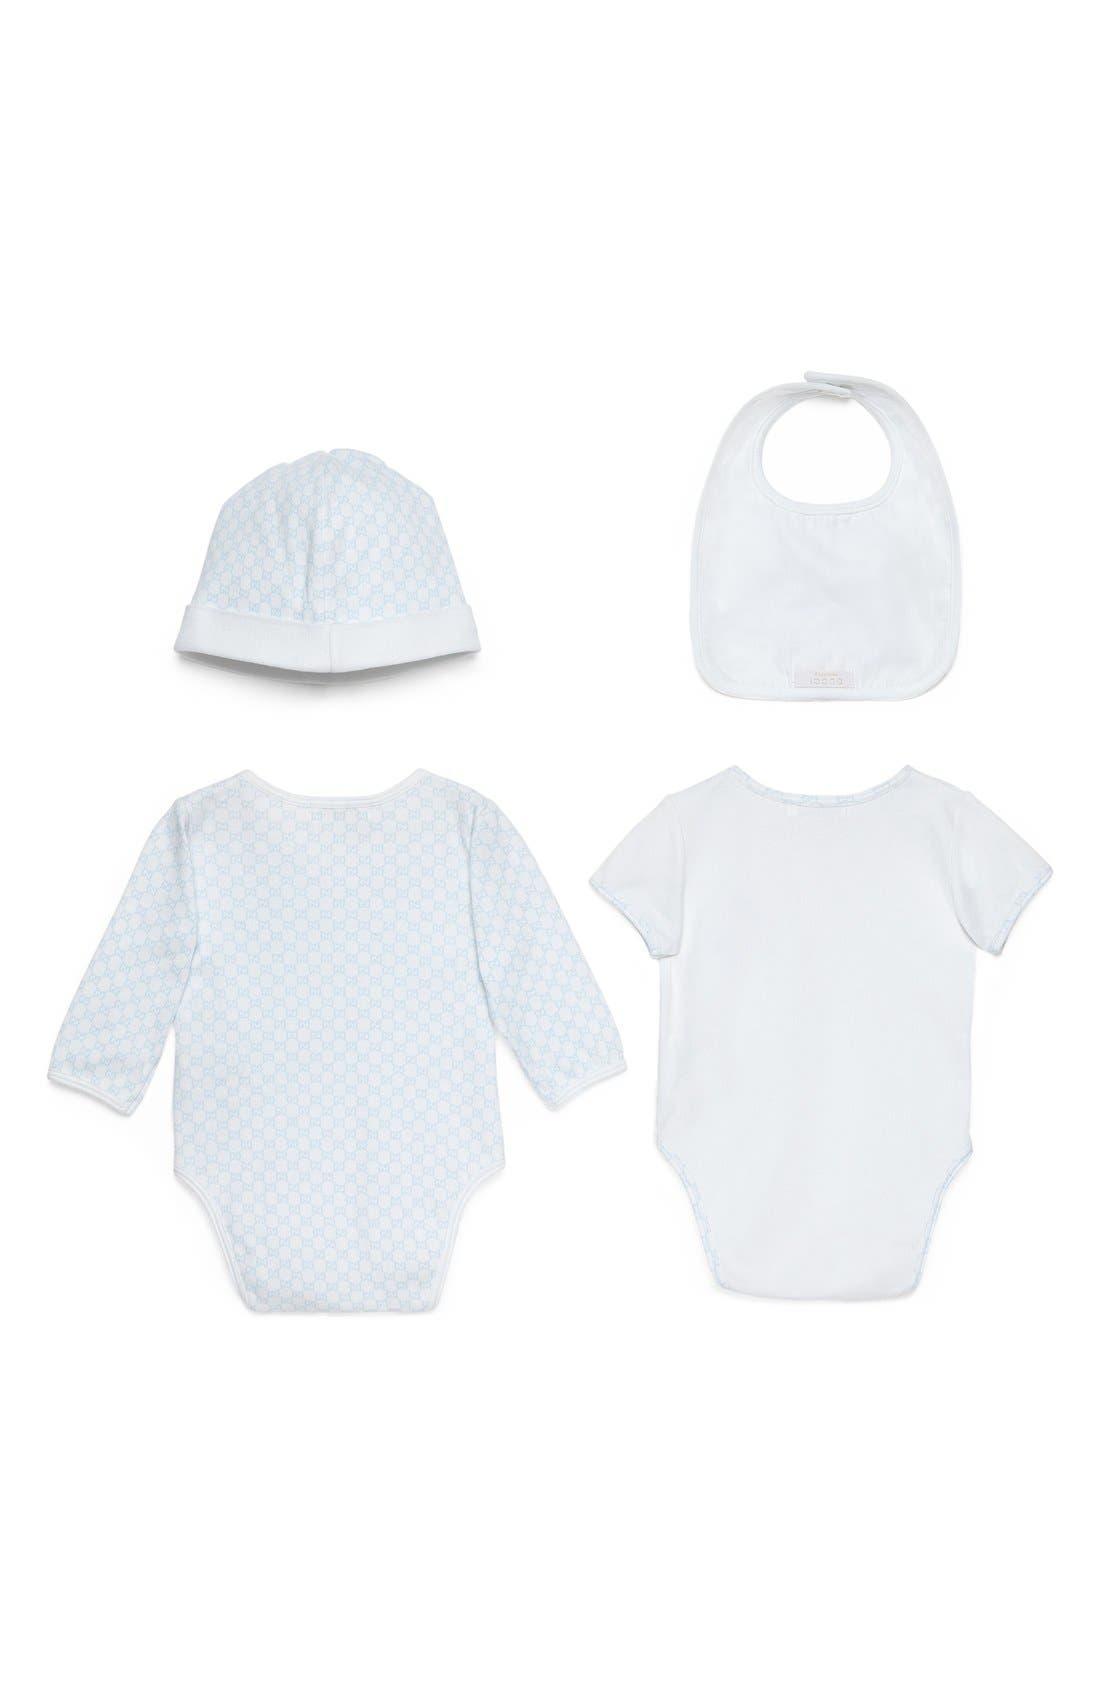 Short Sleeve Bodysuit, Long Sleeve Bodysuit, Hat & Bib Set,                             Alternate thumbnail 4, color,